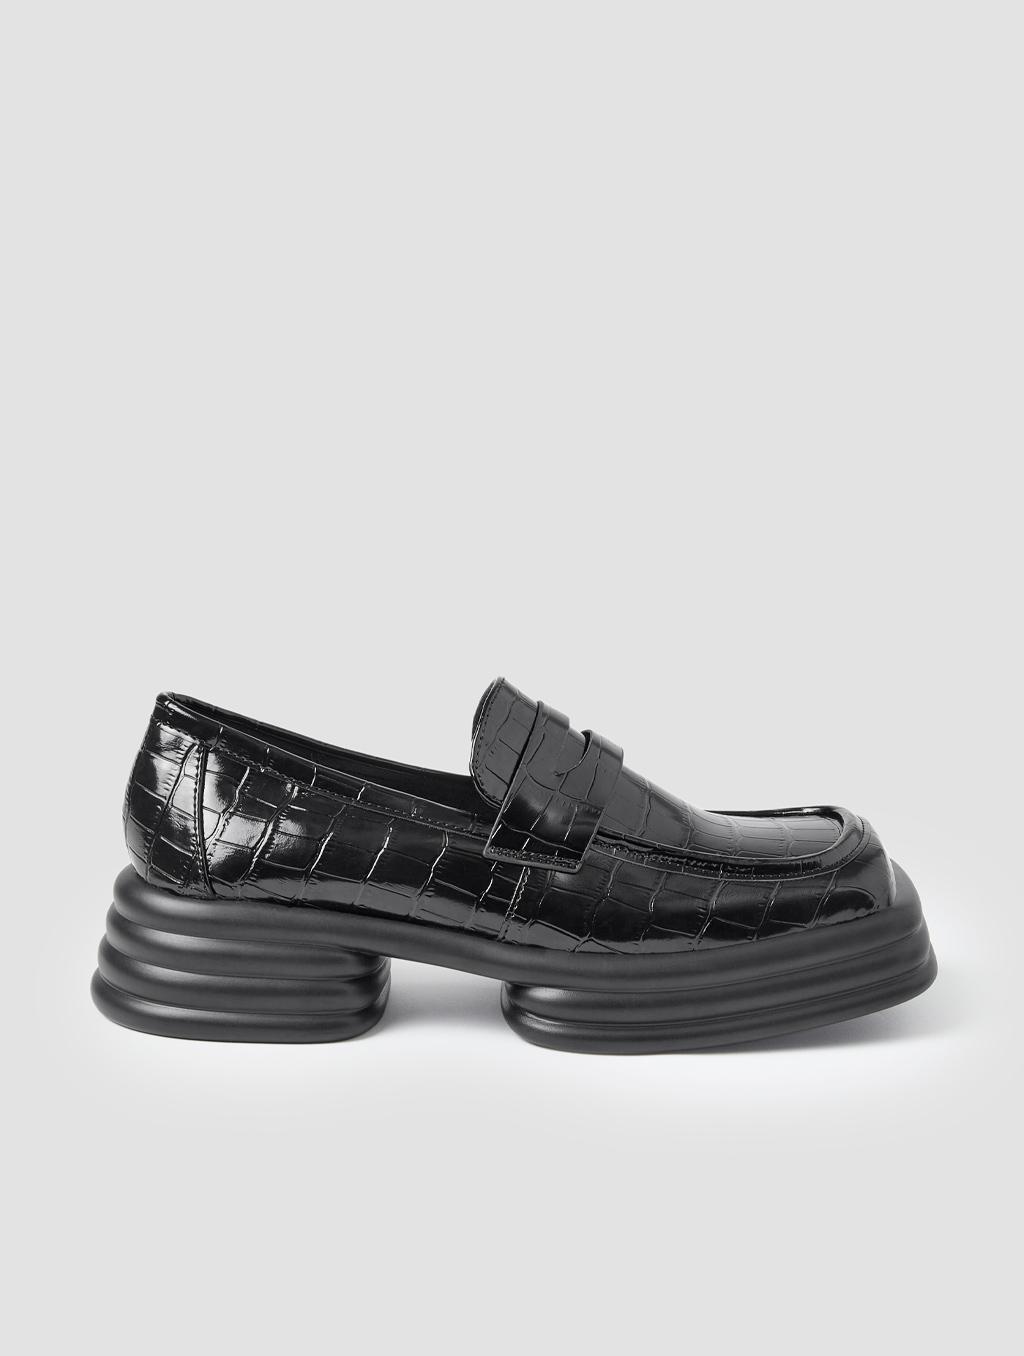 Square Toe Loafers - detail -Crocodile-print Black1